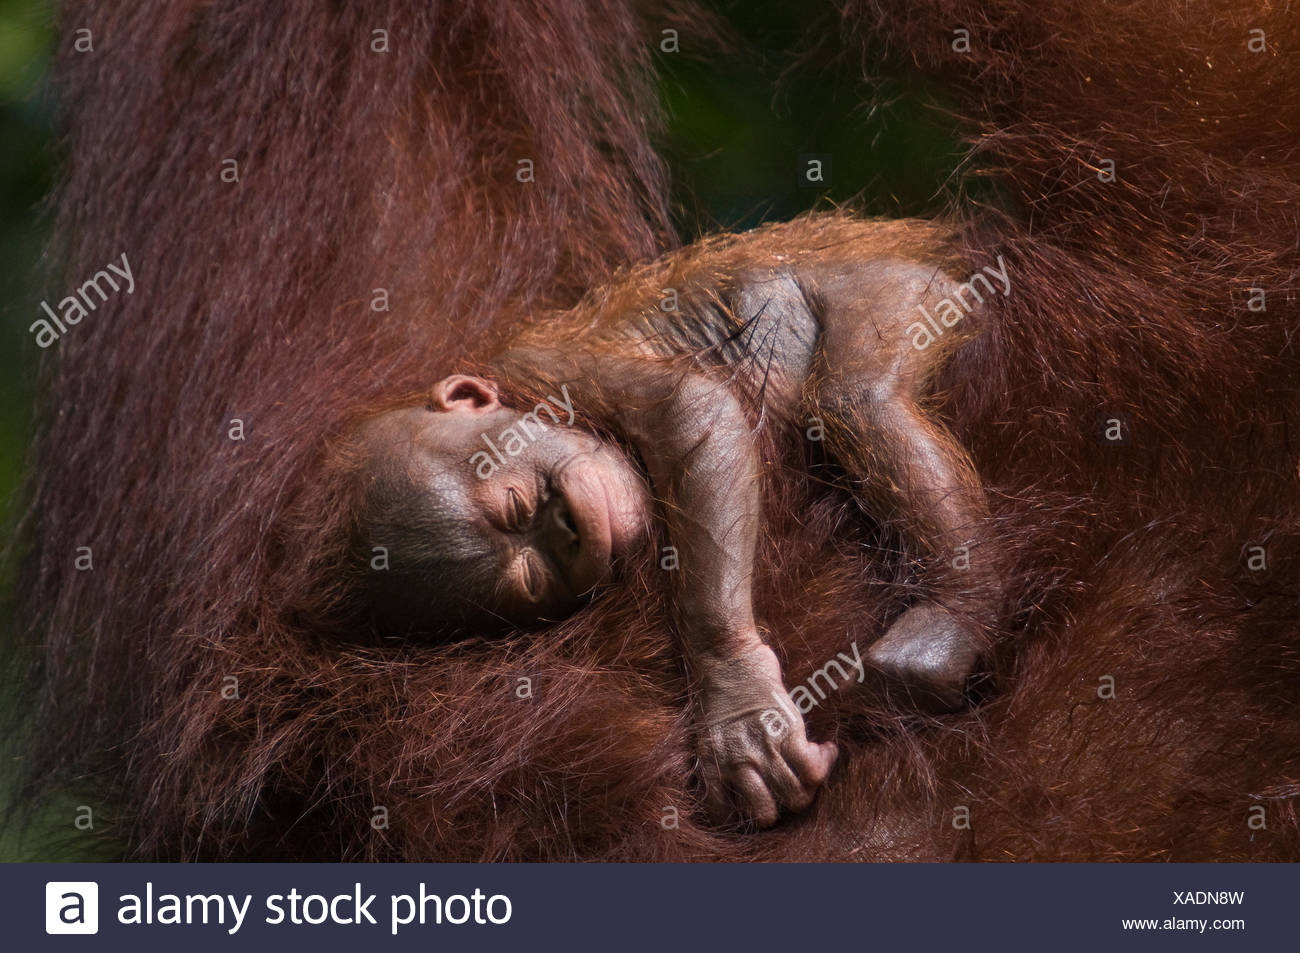 Orang utan (Pongo pygmaeus) baby sleeping in the arms of an adult, Semengoh Nature reserve, Sarawak, Borneo, Malaysia, Endangered - Stock Image